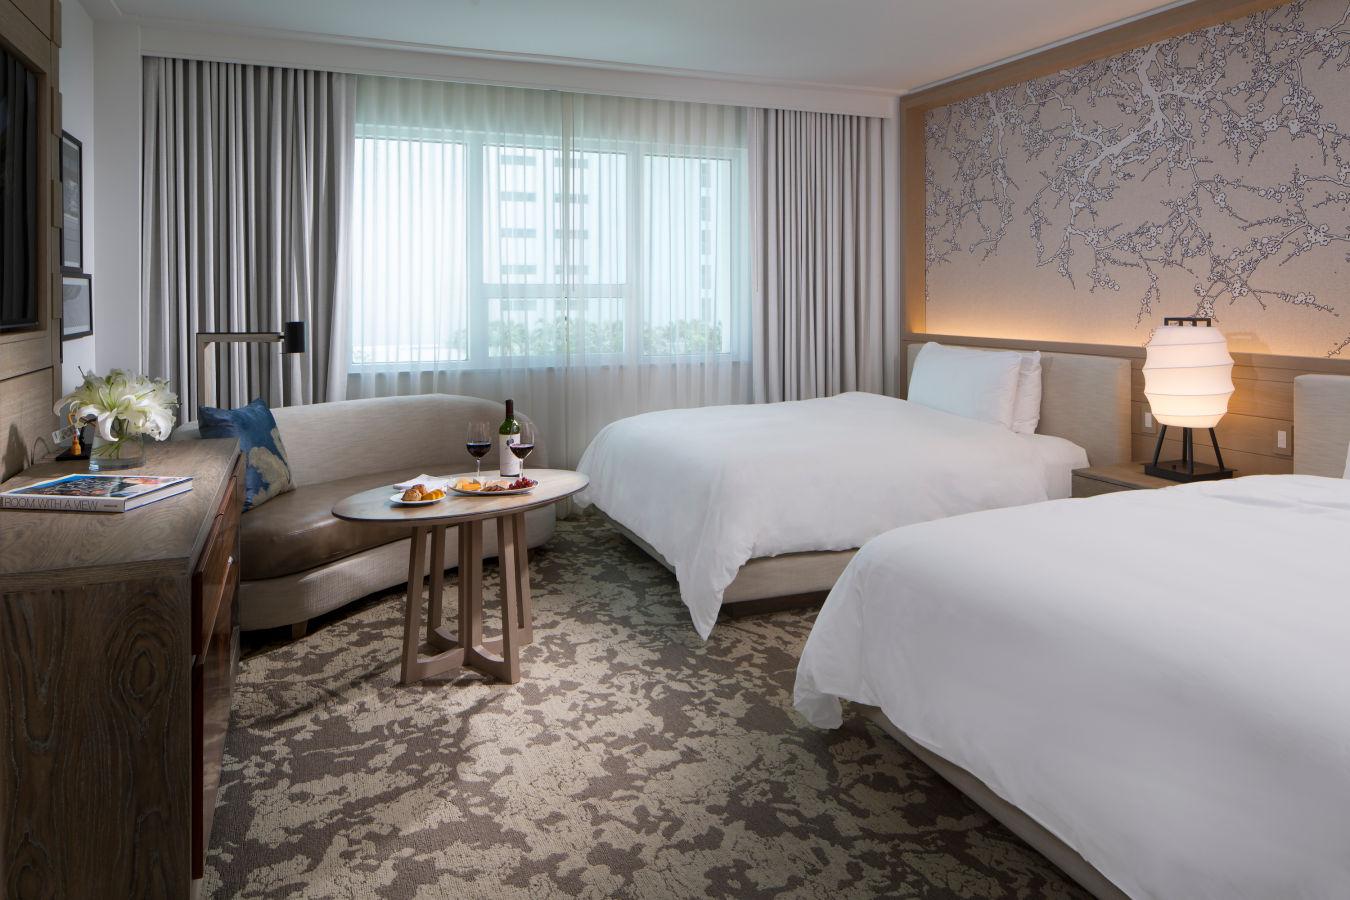 Deluxe Two Queen Bay View - Nobu HotelMiami Beach